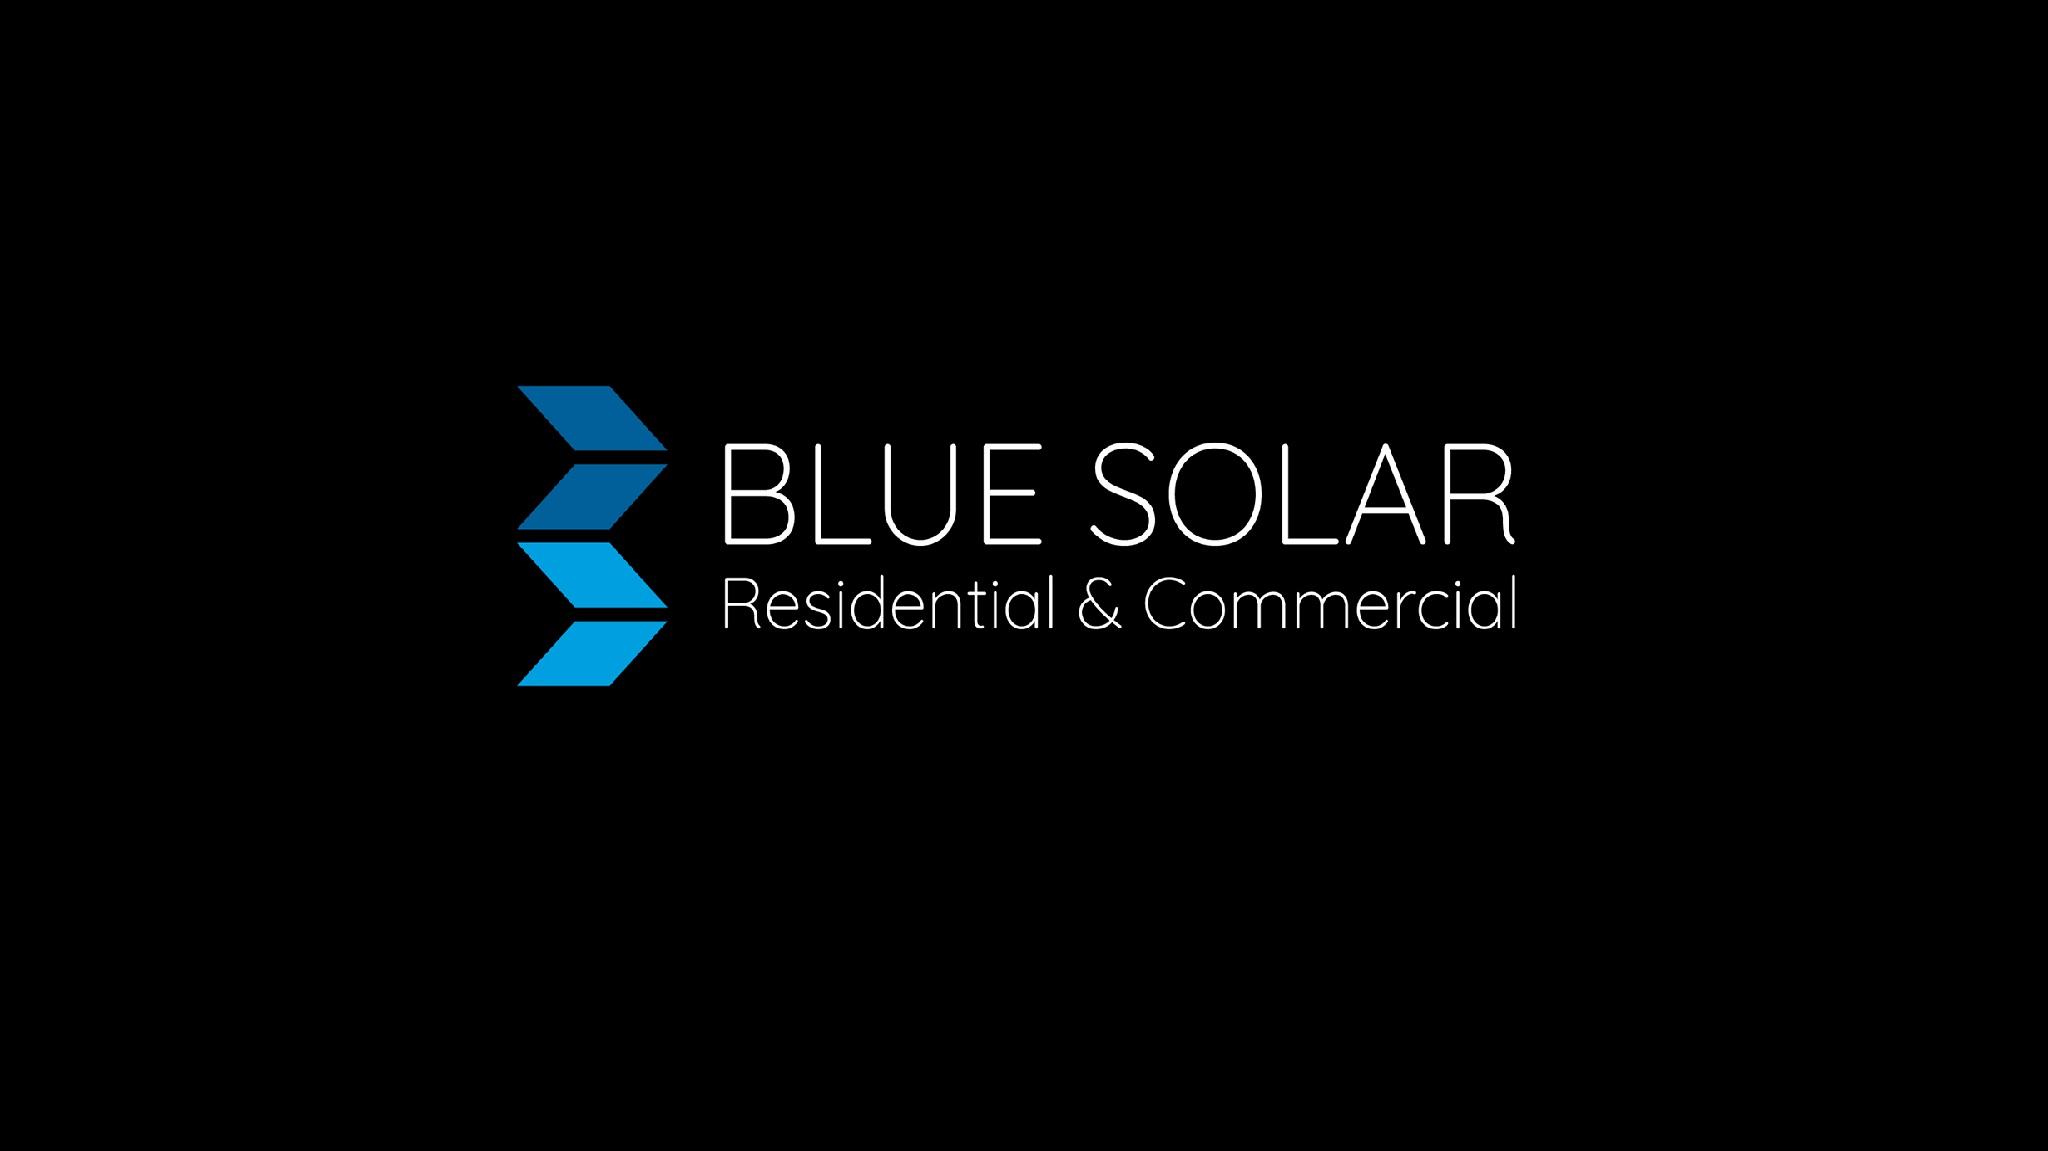 official business logo of Blue Solar Pty Ltd